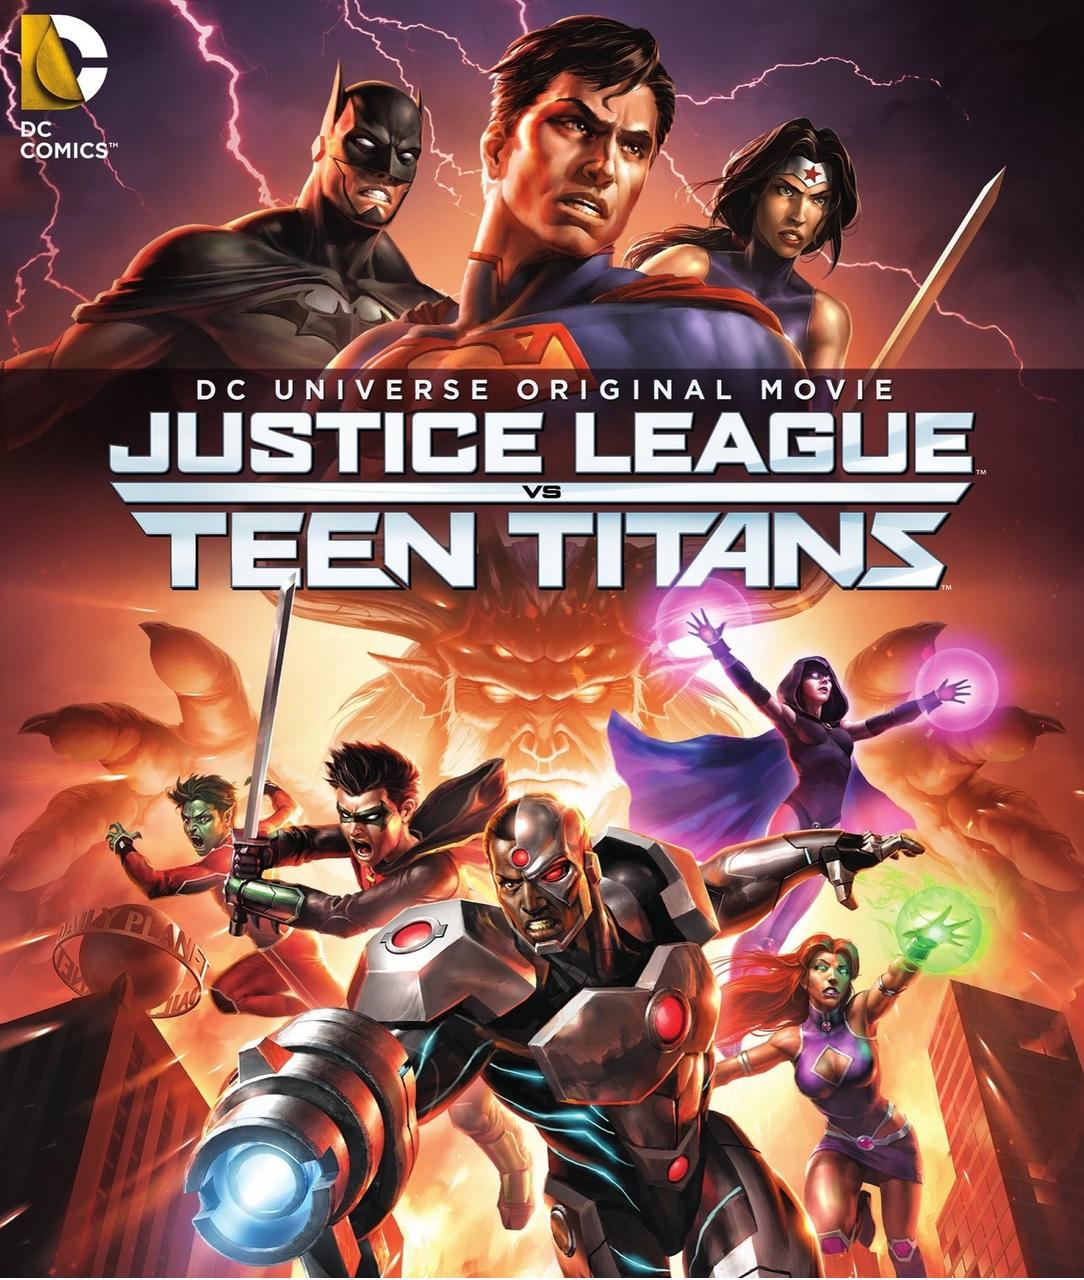 Teen titans film